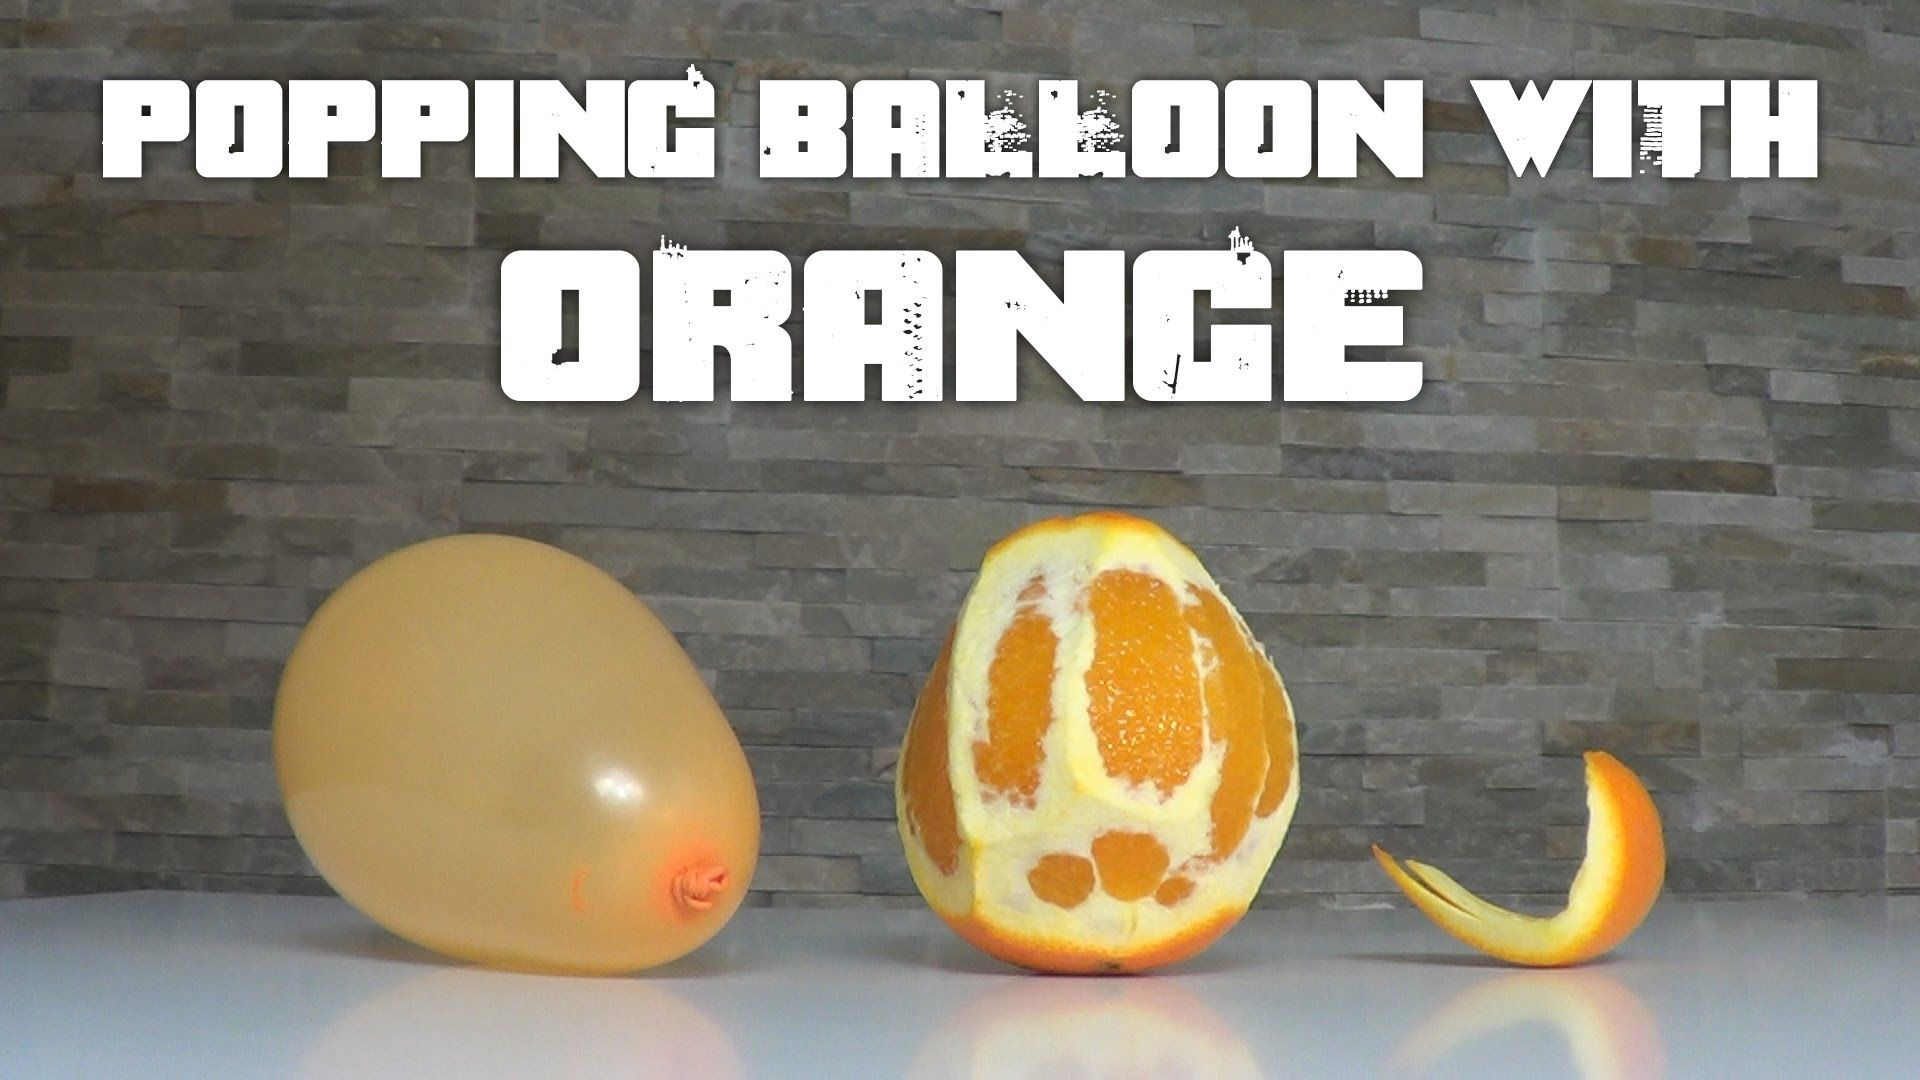 BOOM! Orange and Balloon Science Experiment Creates